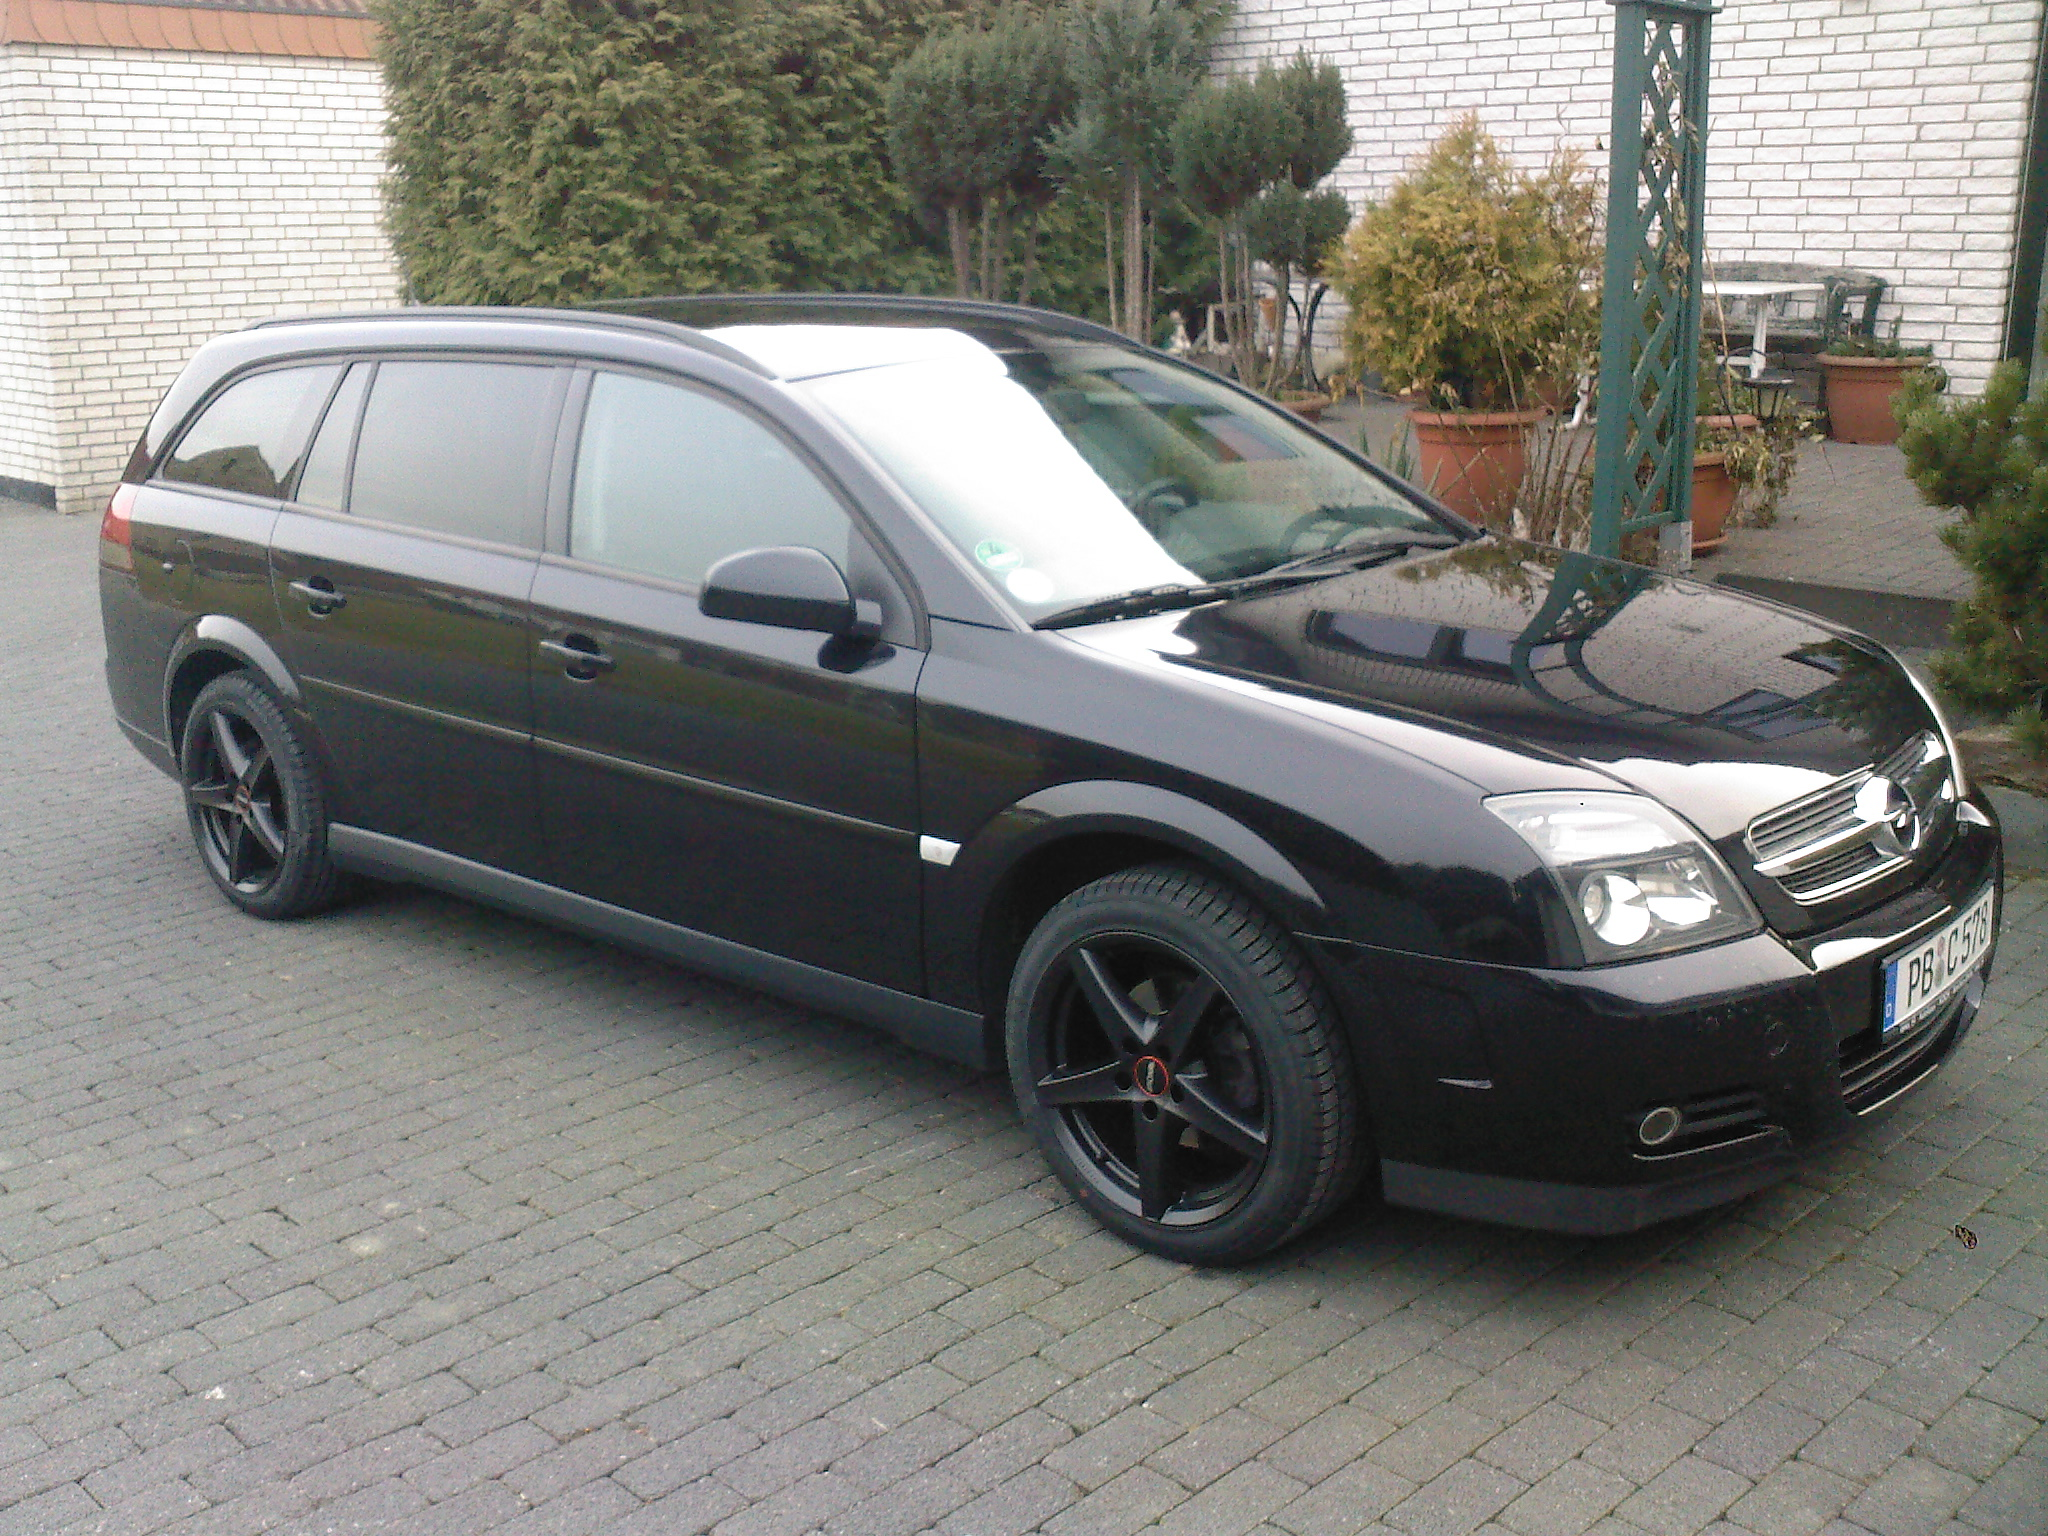 Opel Vectra 1.9 CDTi Caravan